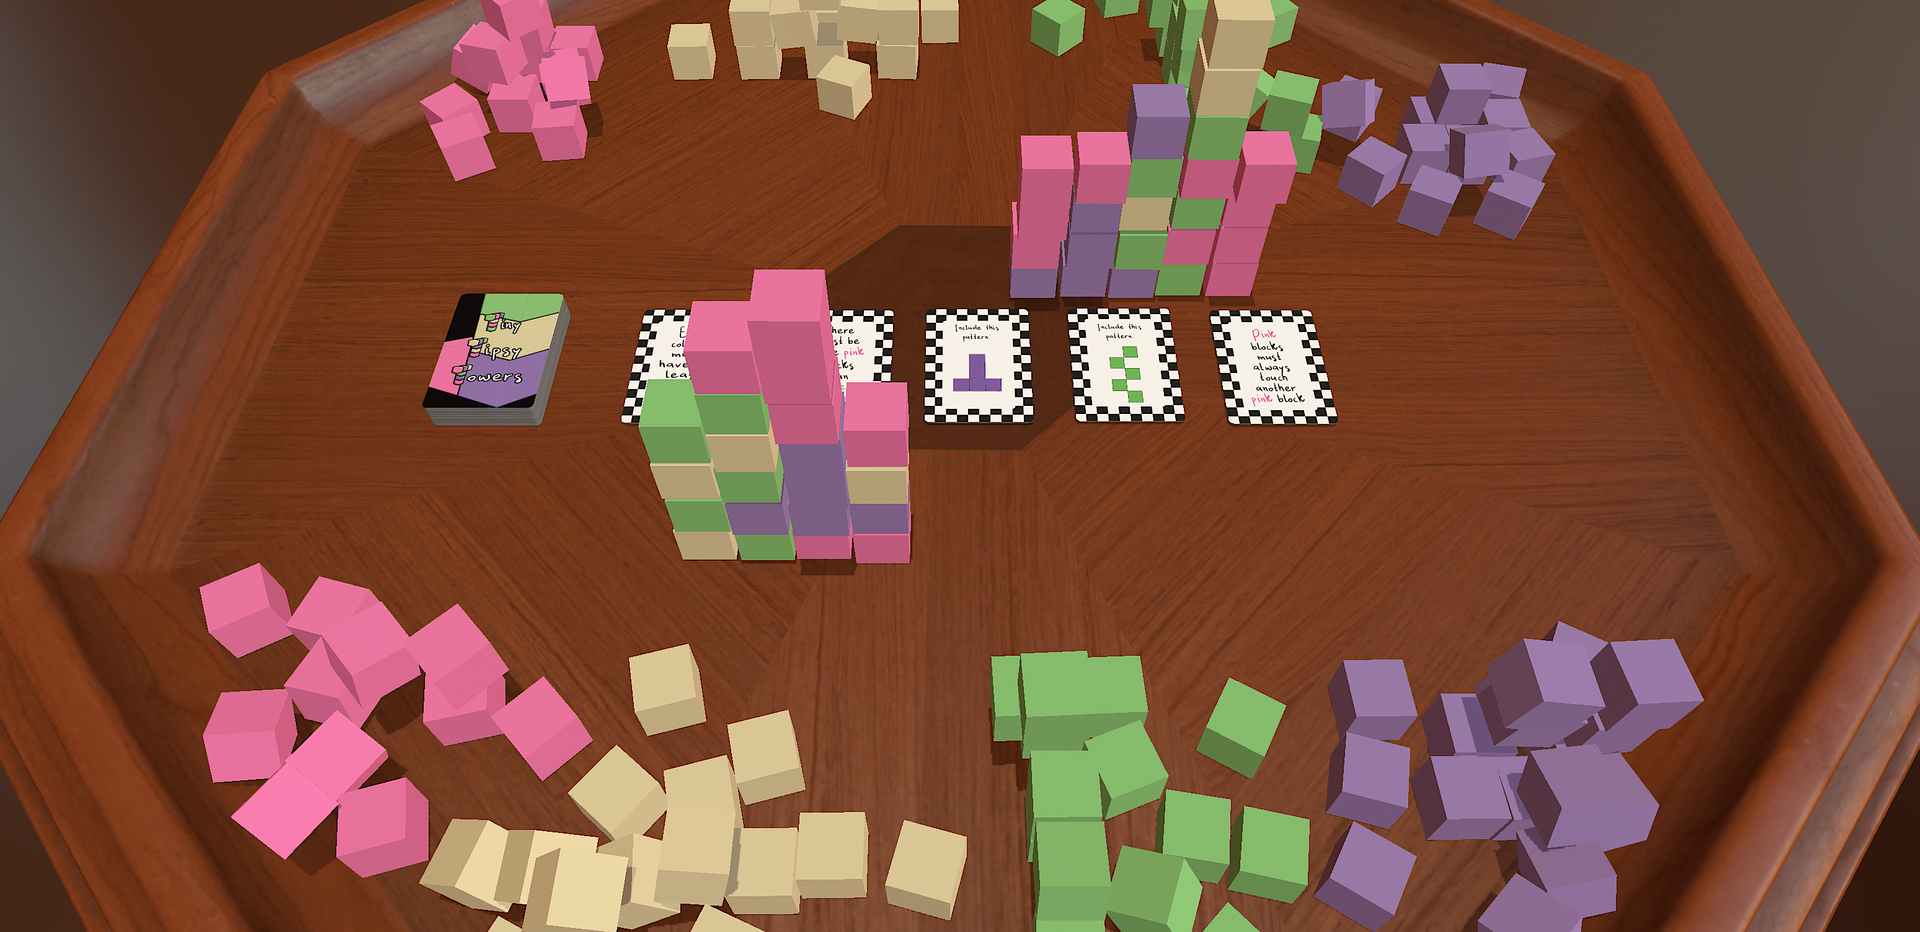 Game Screenshot 67PNG.PNG